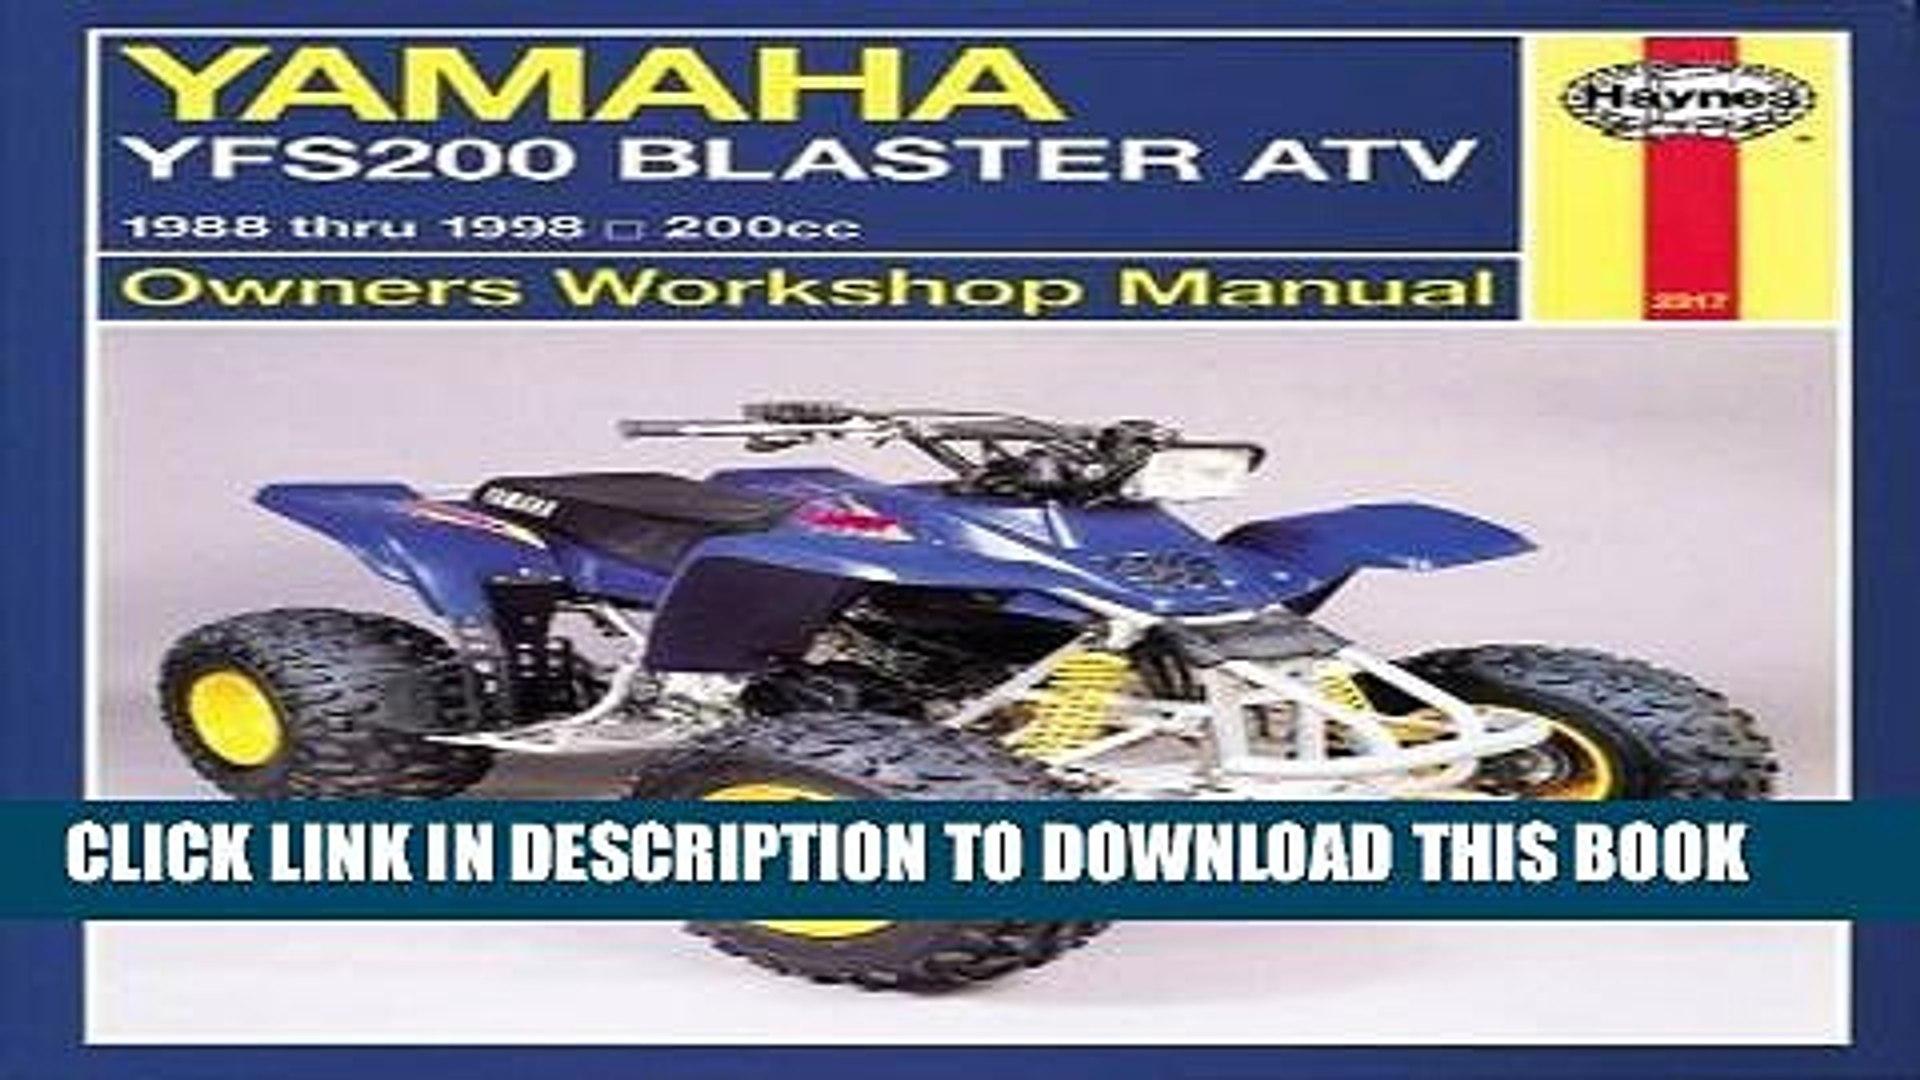 Winderosa Complete Gasket Kit For Yamaha YFS200 Blaster 1988-2006 200cc